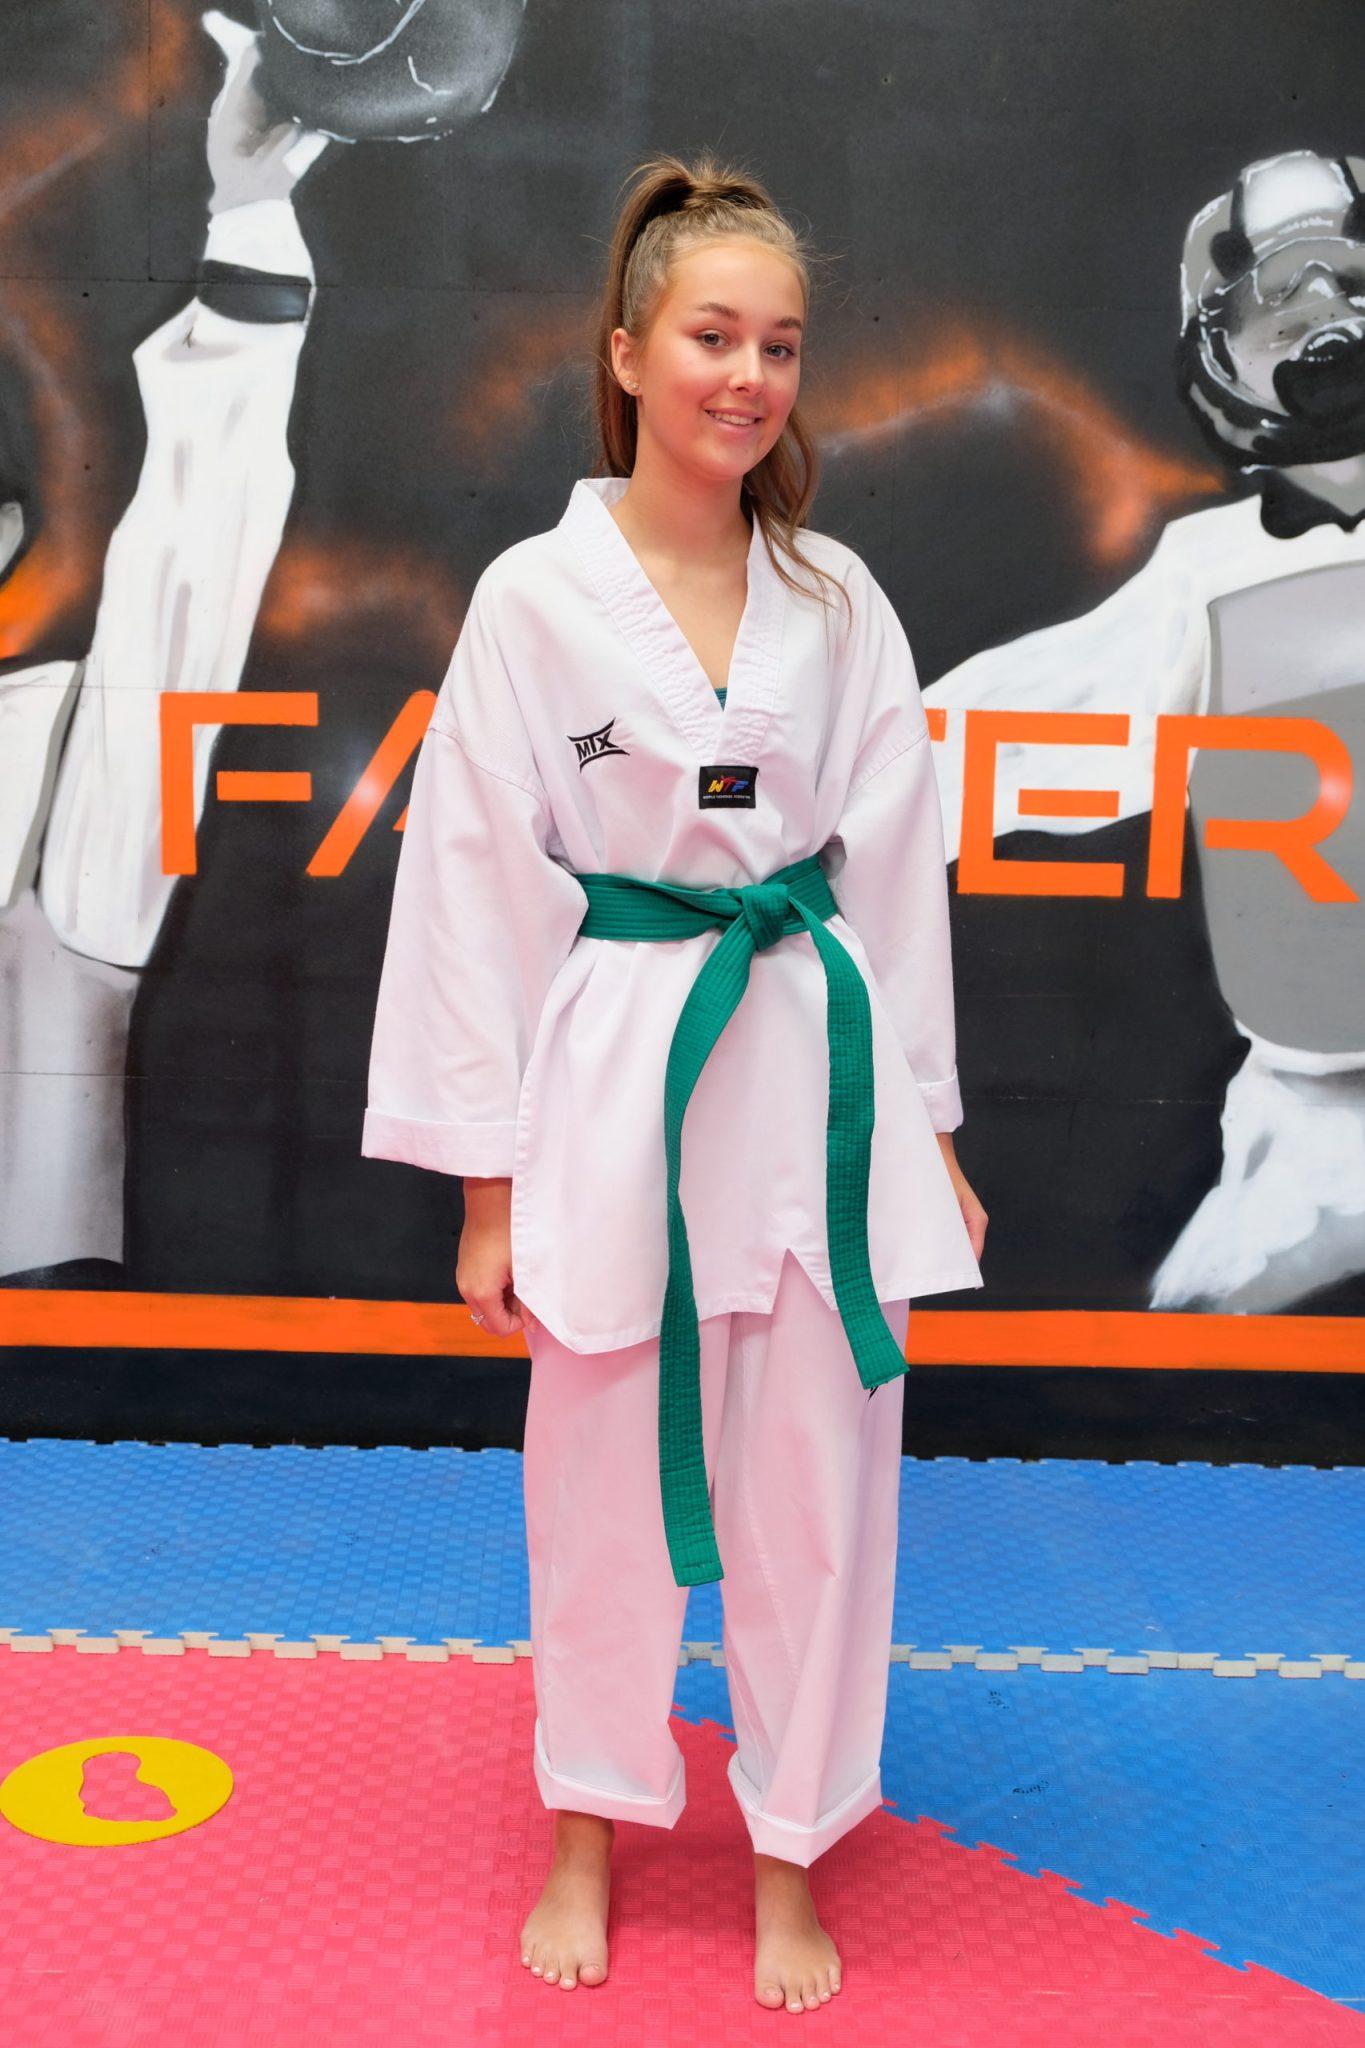 tusah-dobok-order-raw-taekwondo